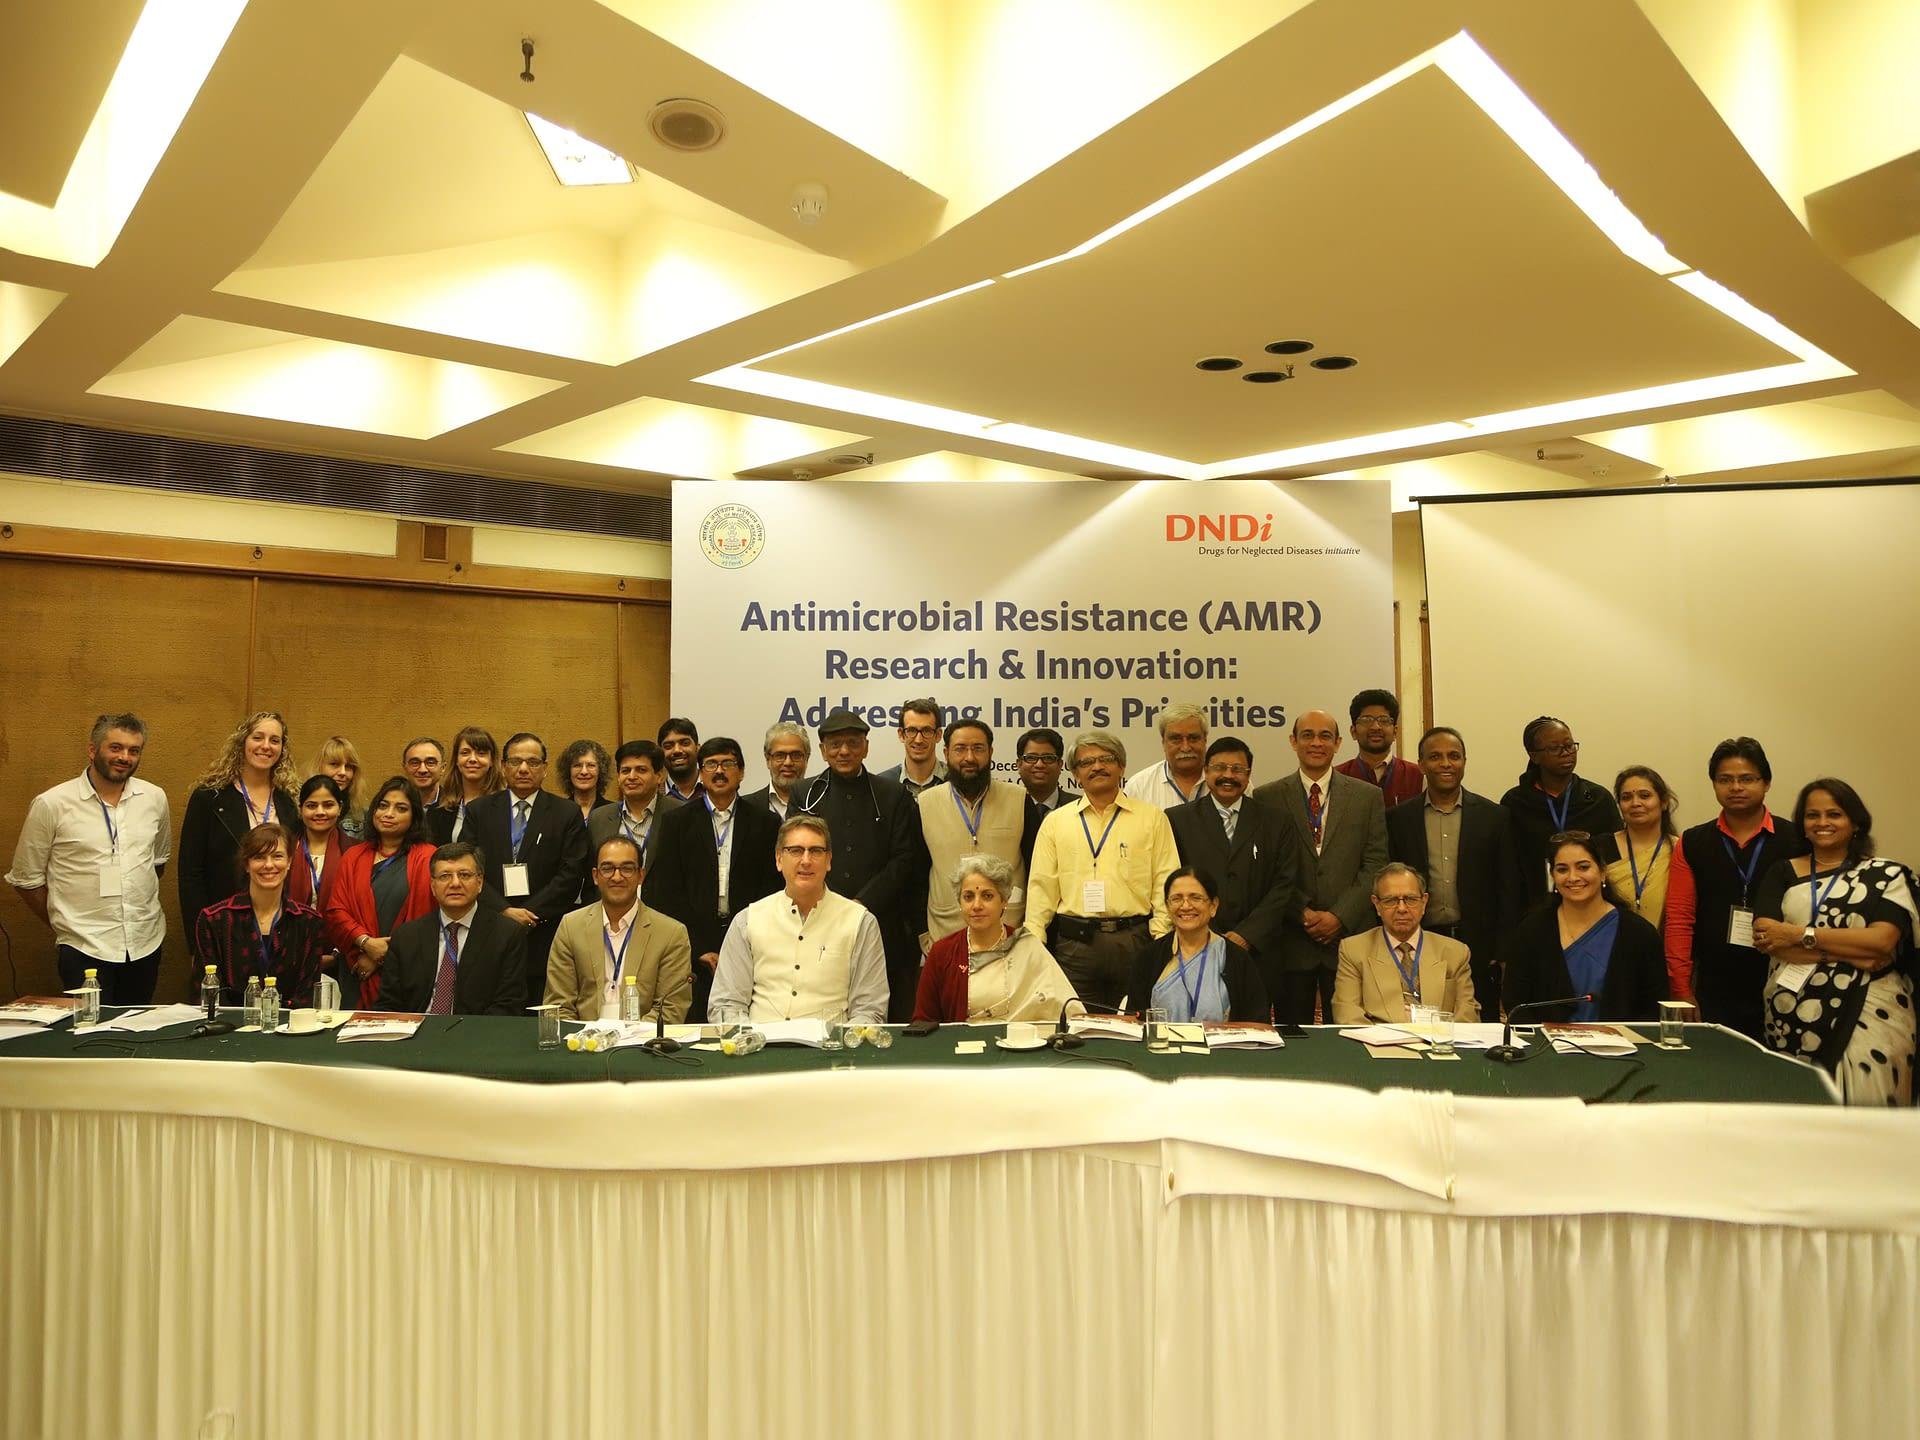 Participants at AMR Meeting in Delhi, India